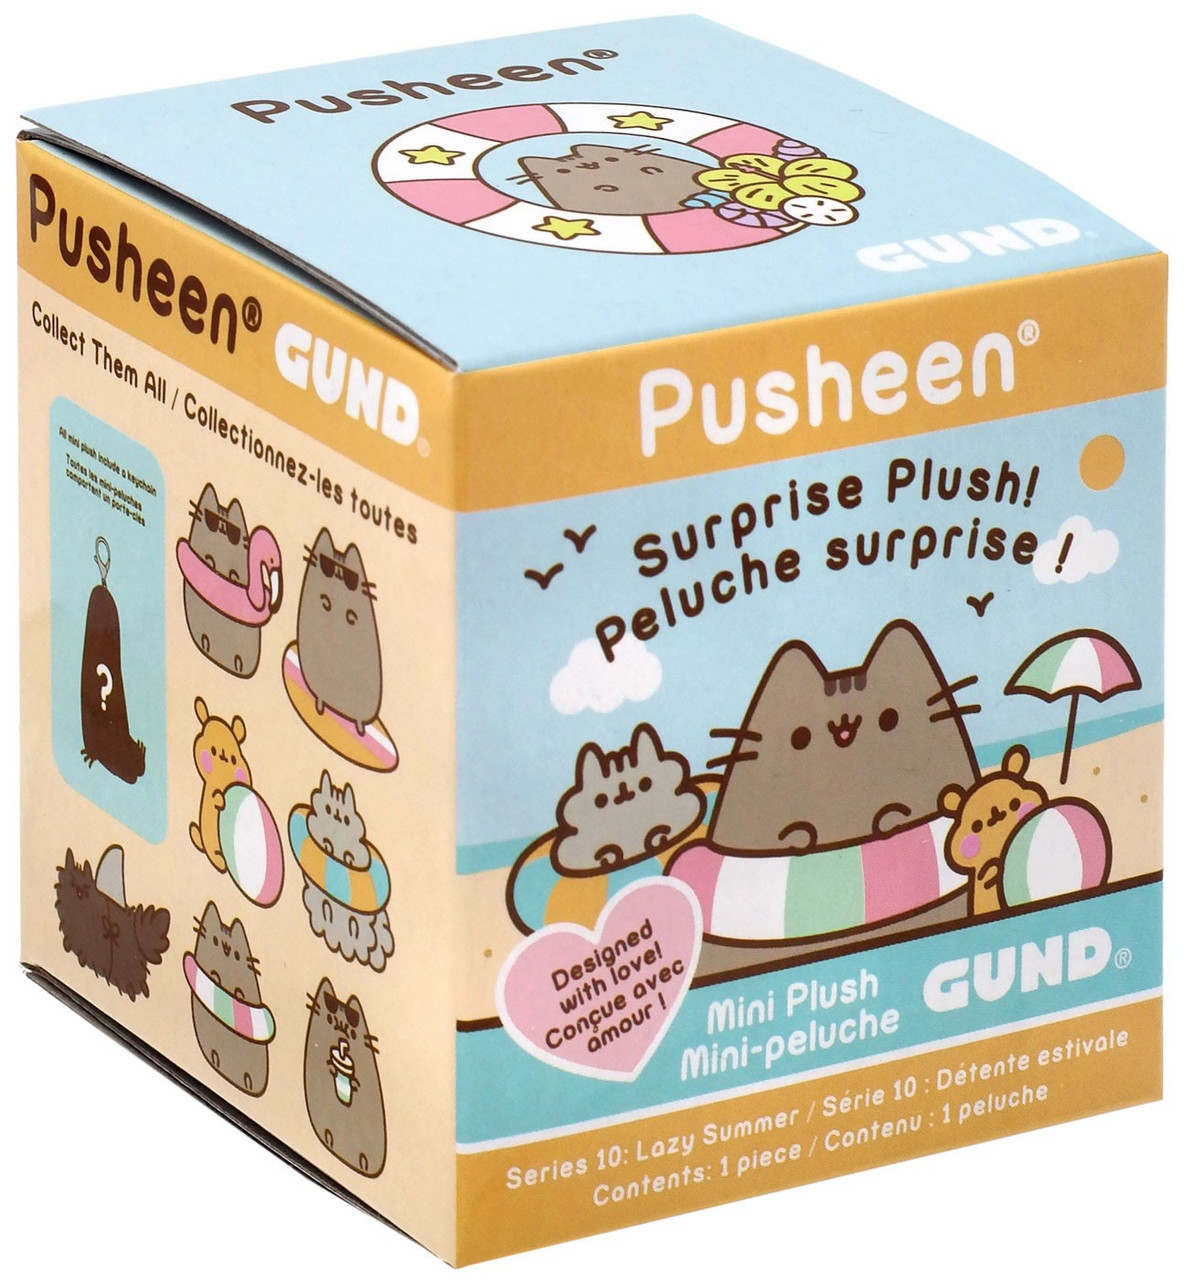 b4519bbe6d2b0 Pusheen Series 10 Lazy Summer Mystery Pack